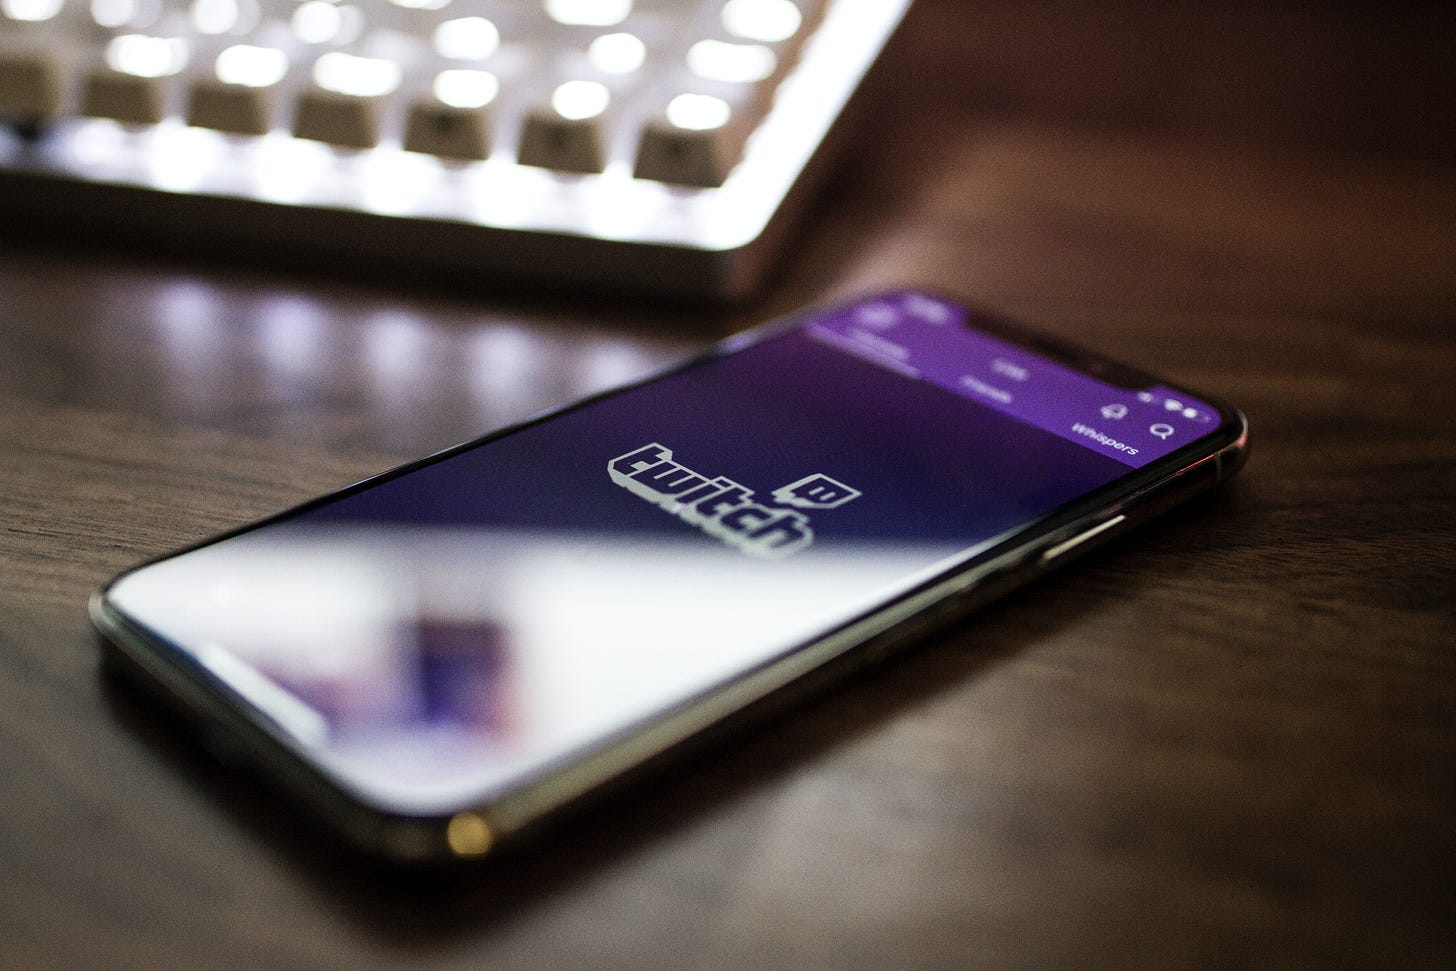 Twitch app shown on a phone laid on a desk. Caspar Camille Rubin / Unsplash